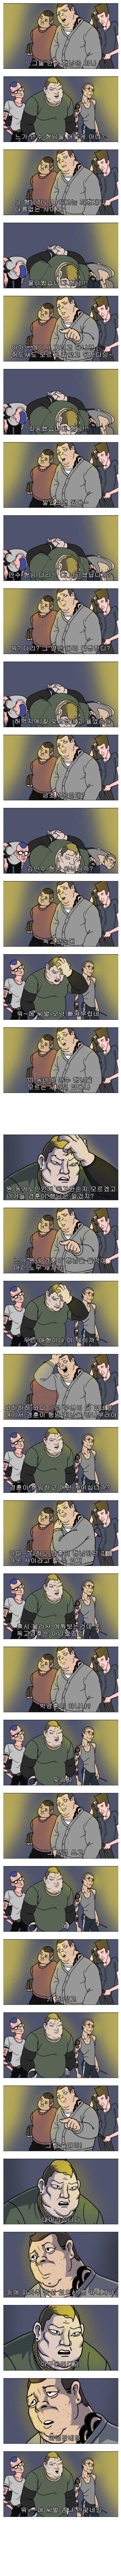 2.jpg 양아치 족보 확인하는 만화